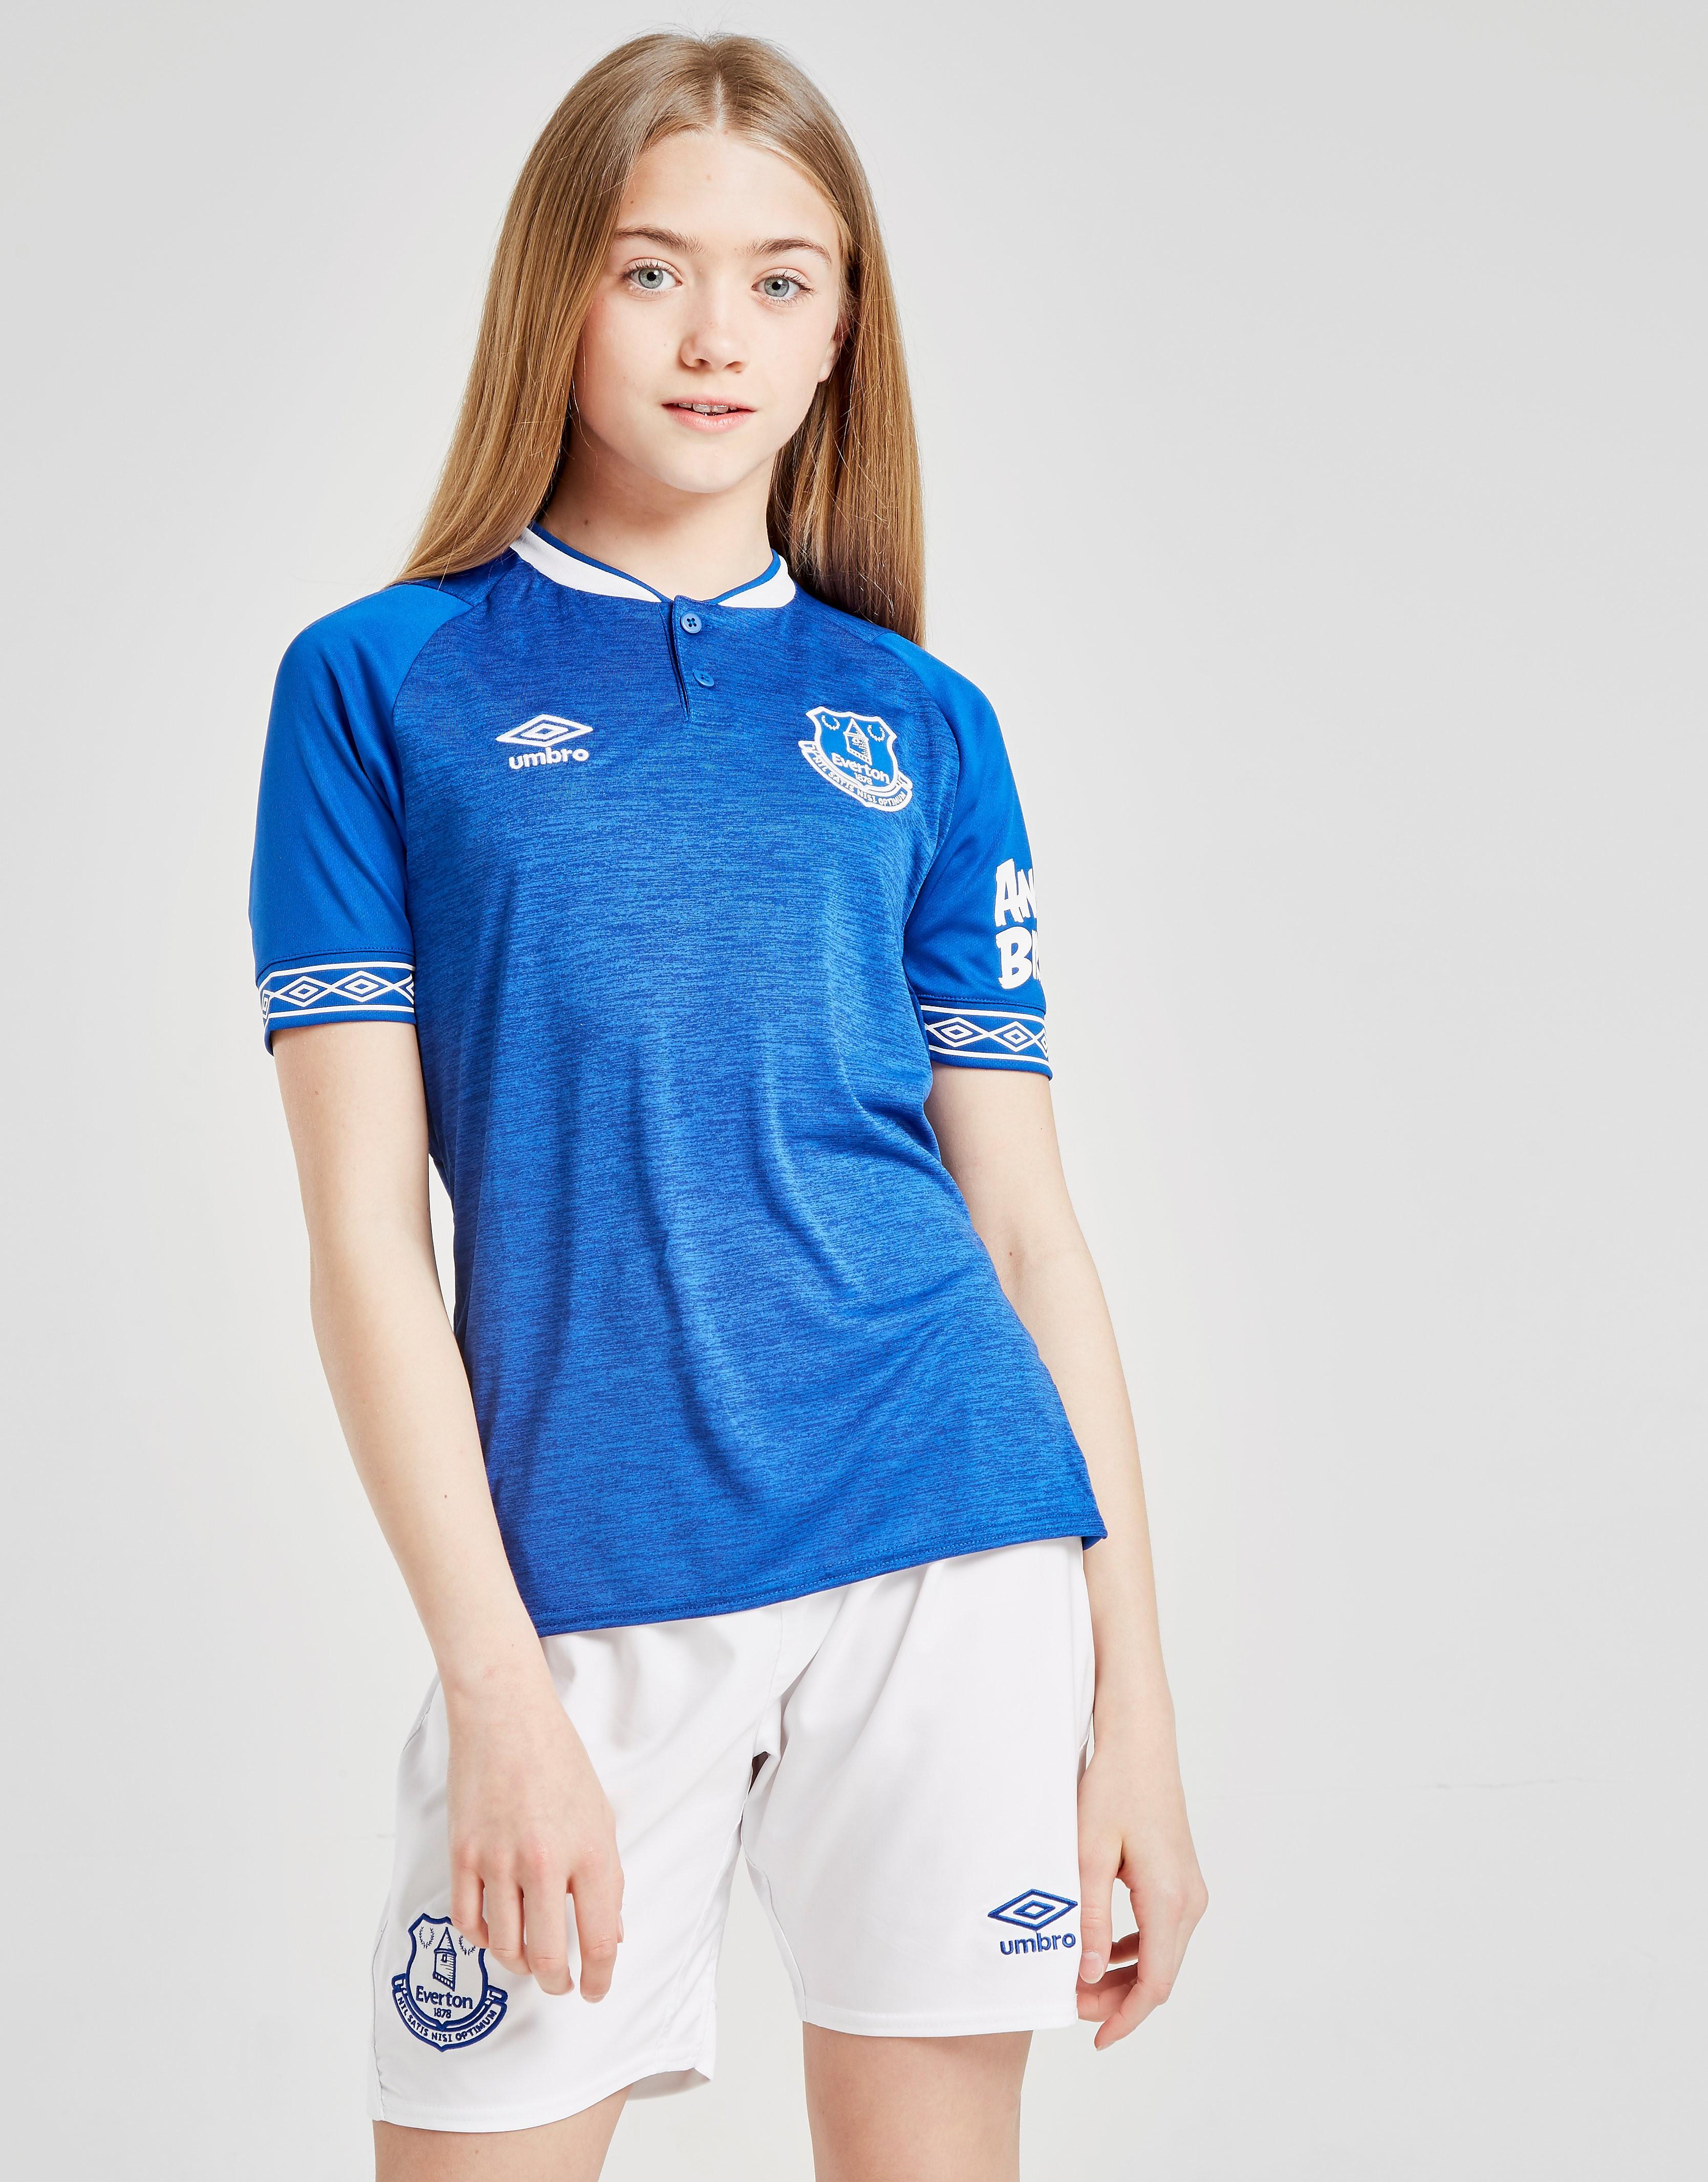 Umbro Maillot Domicile Everton FC 2018/19 Junior